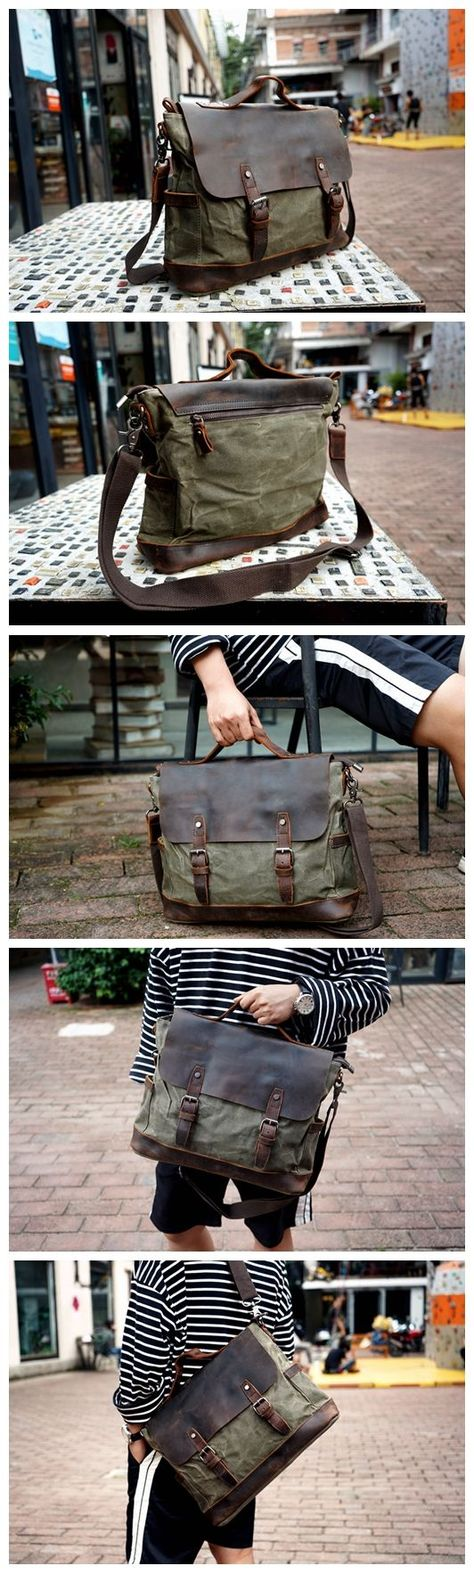 Handmade Waxed Canvas Messenger Bag Men s Leather Briefcase Cross Body Bag  Canvas Satchel Bag YC09 - 78f01c2f231d2